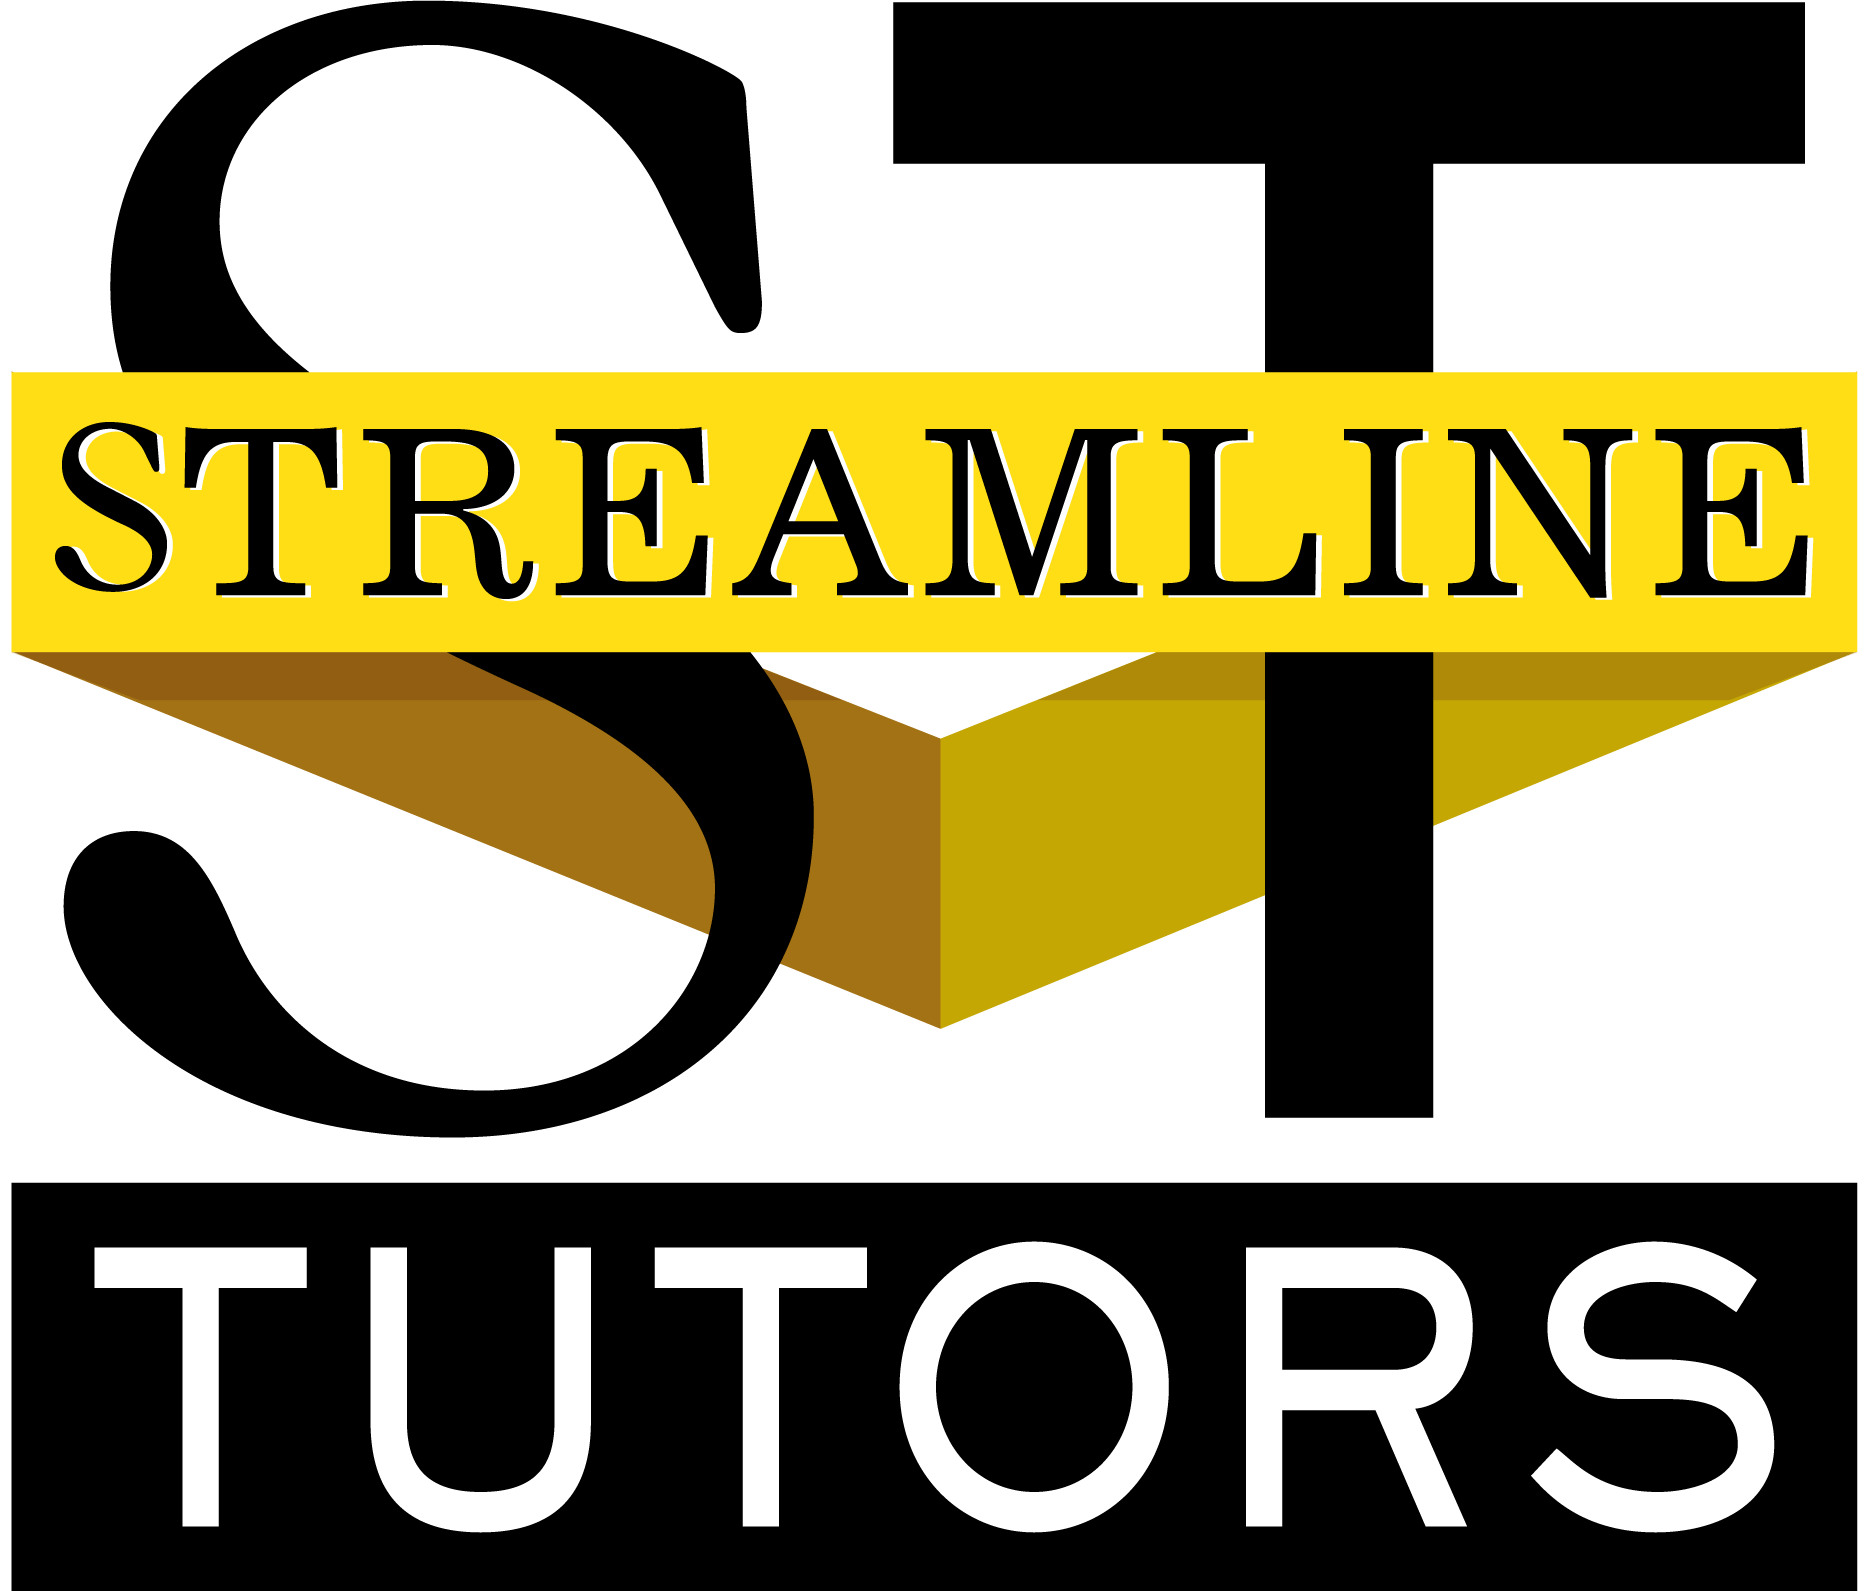 Streamline Tutors